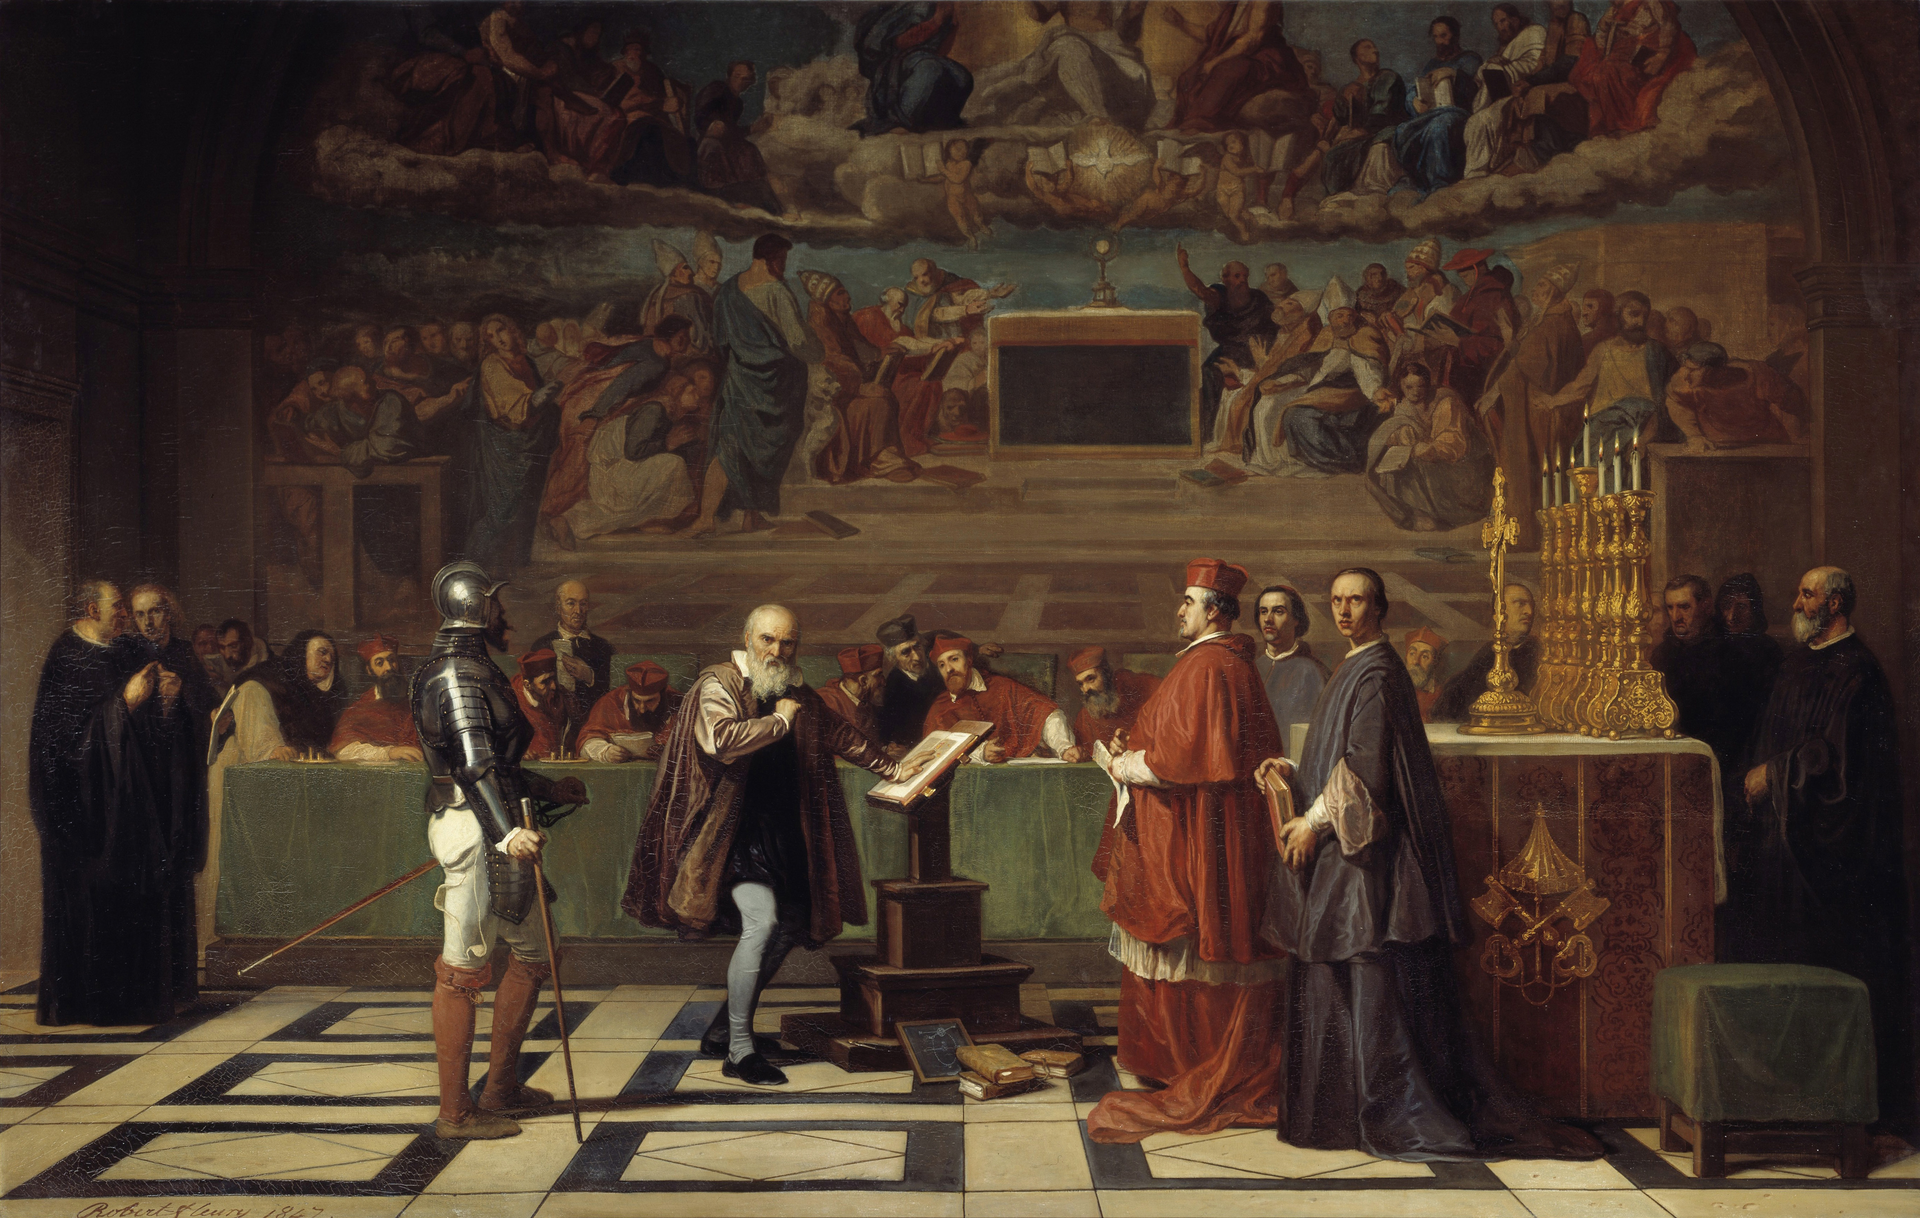 Жозеф-Николя Робер-Флери «Галилей перед судом инквизиции» (1847, Лувр, Париж)